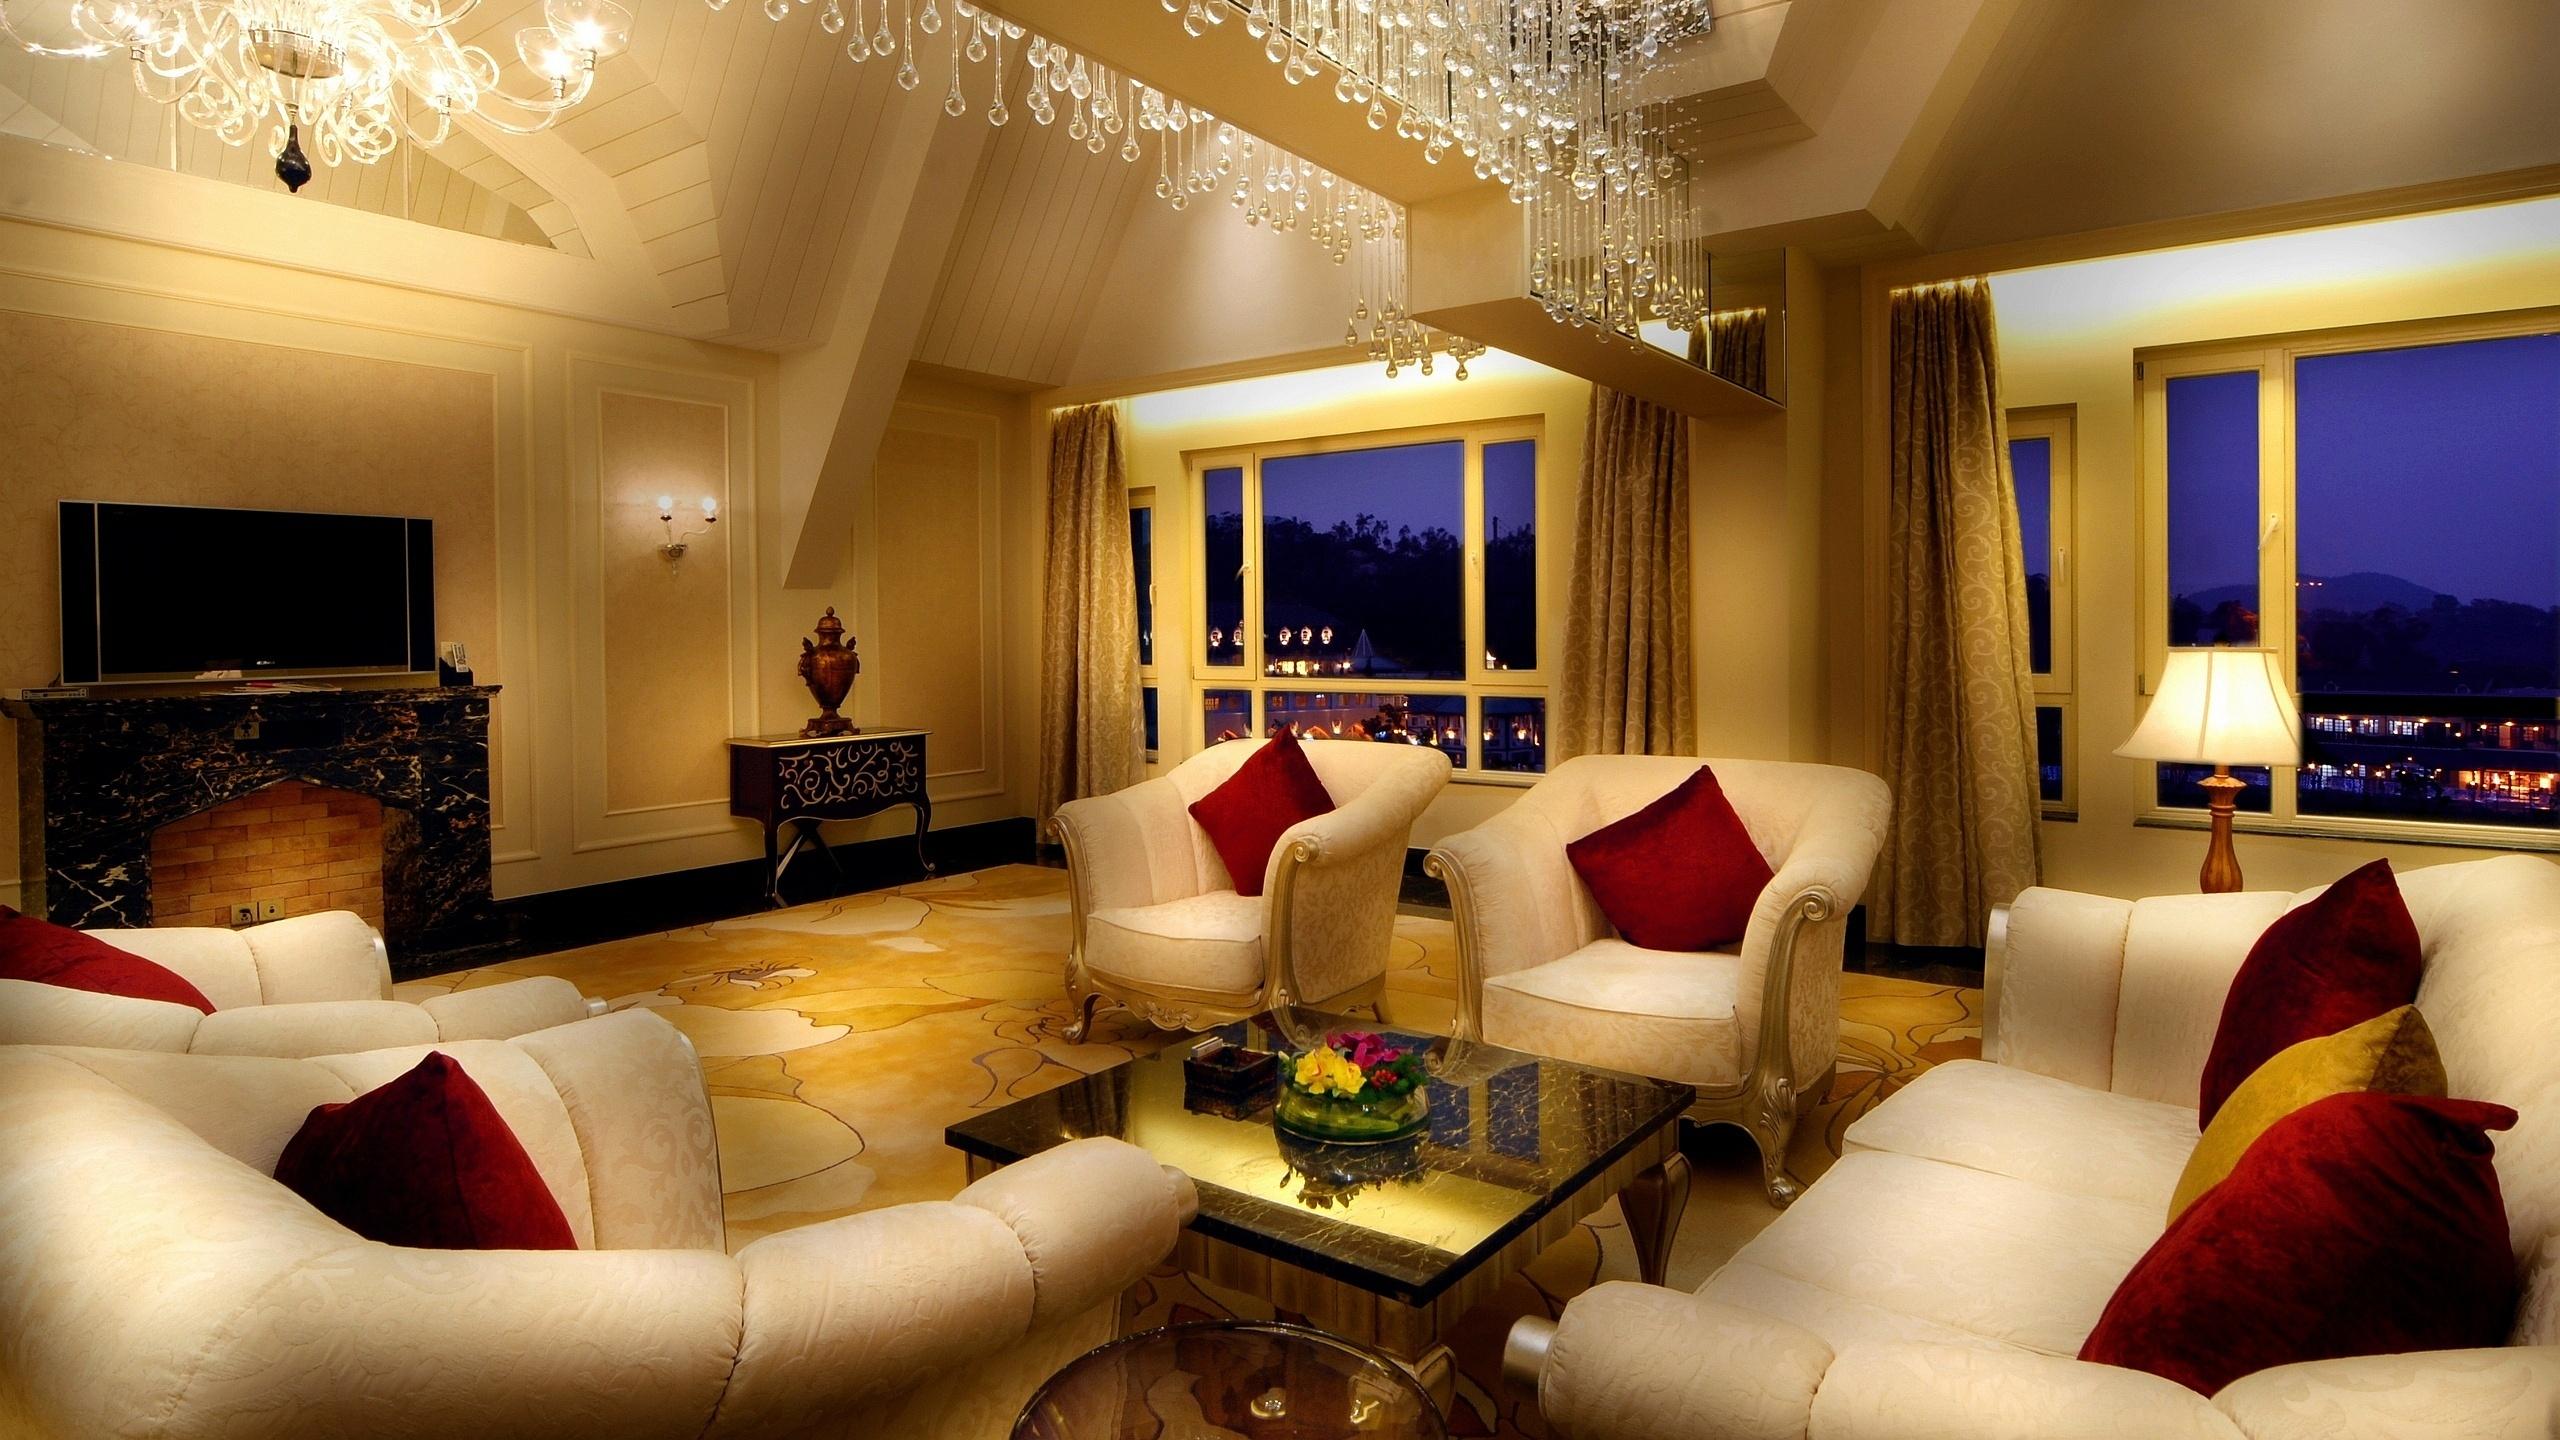 luxury living room wallpaper 49821